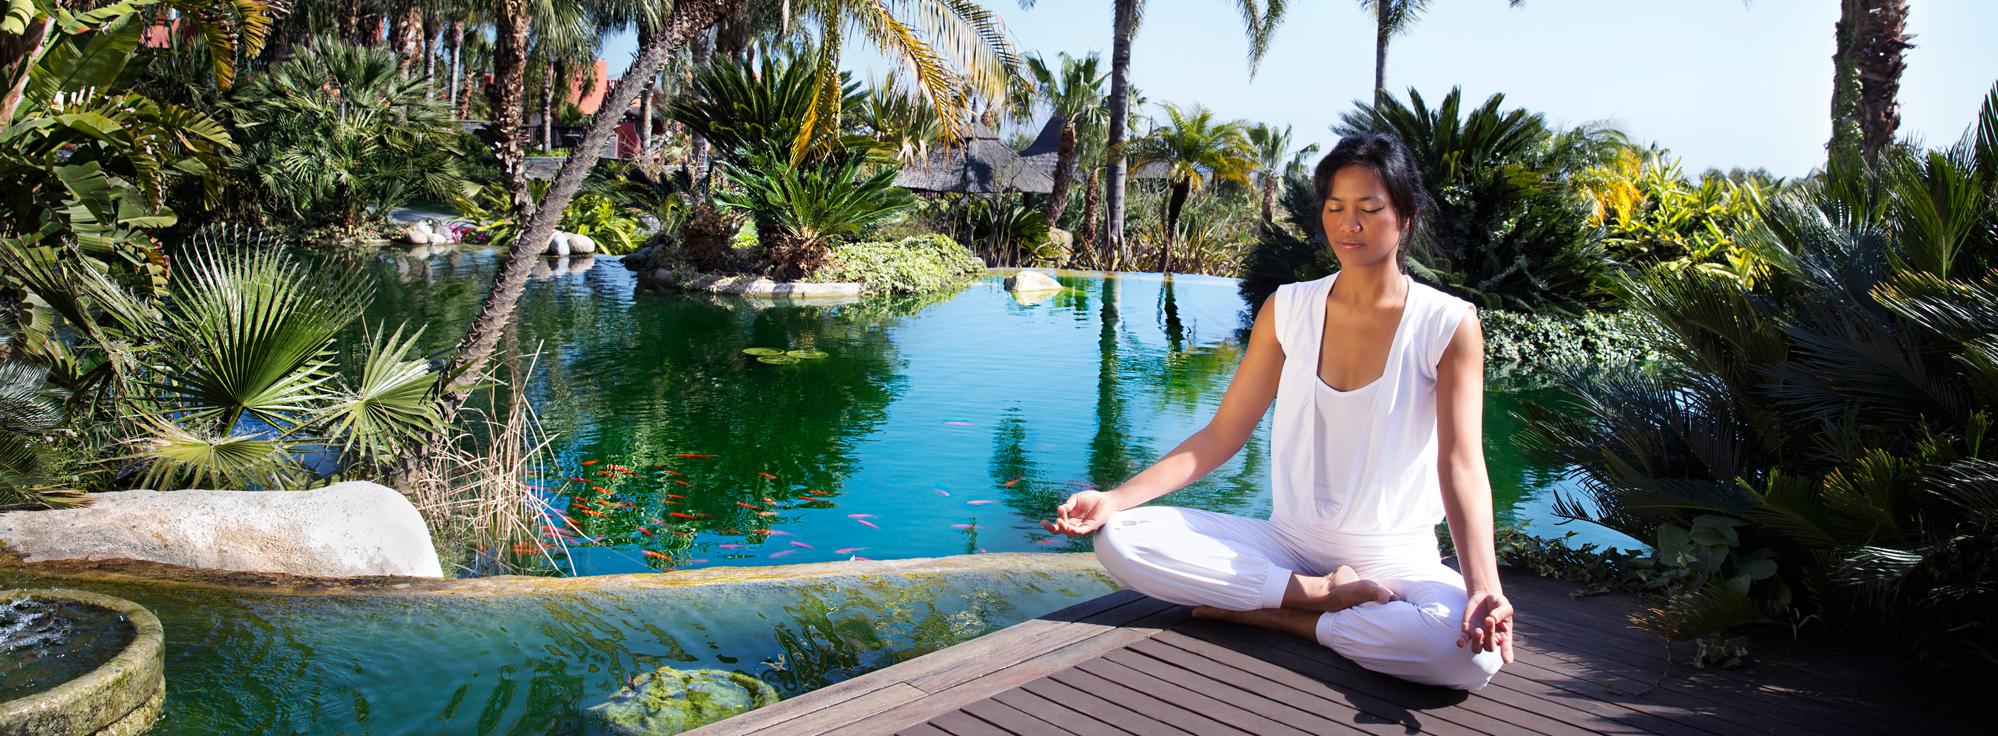 wellness-retreat-spain